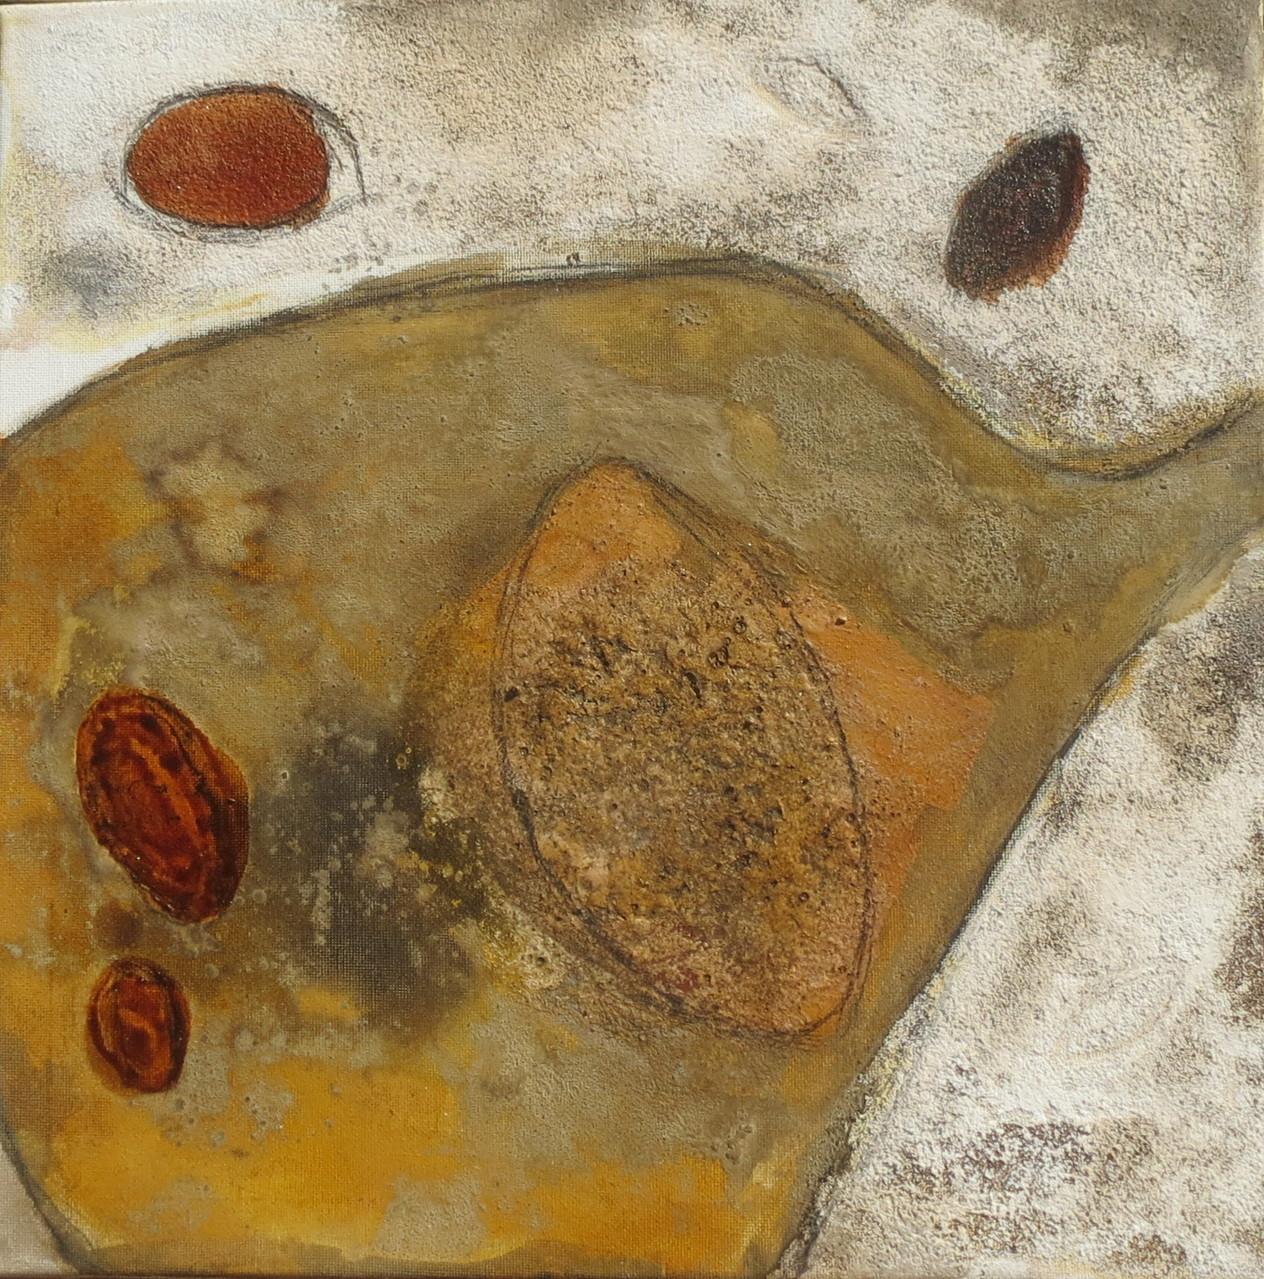 Ovale, 40cm x 40cm, Mixed Media auf Leinwand